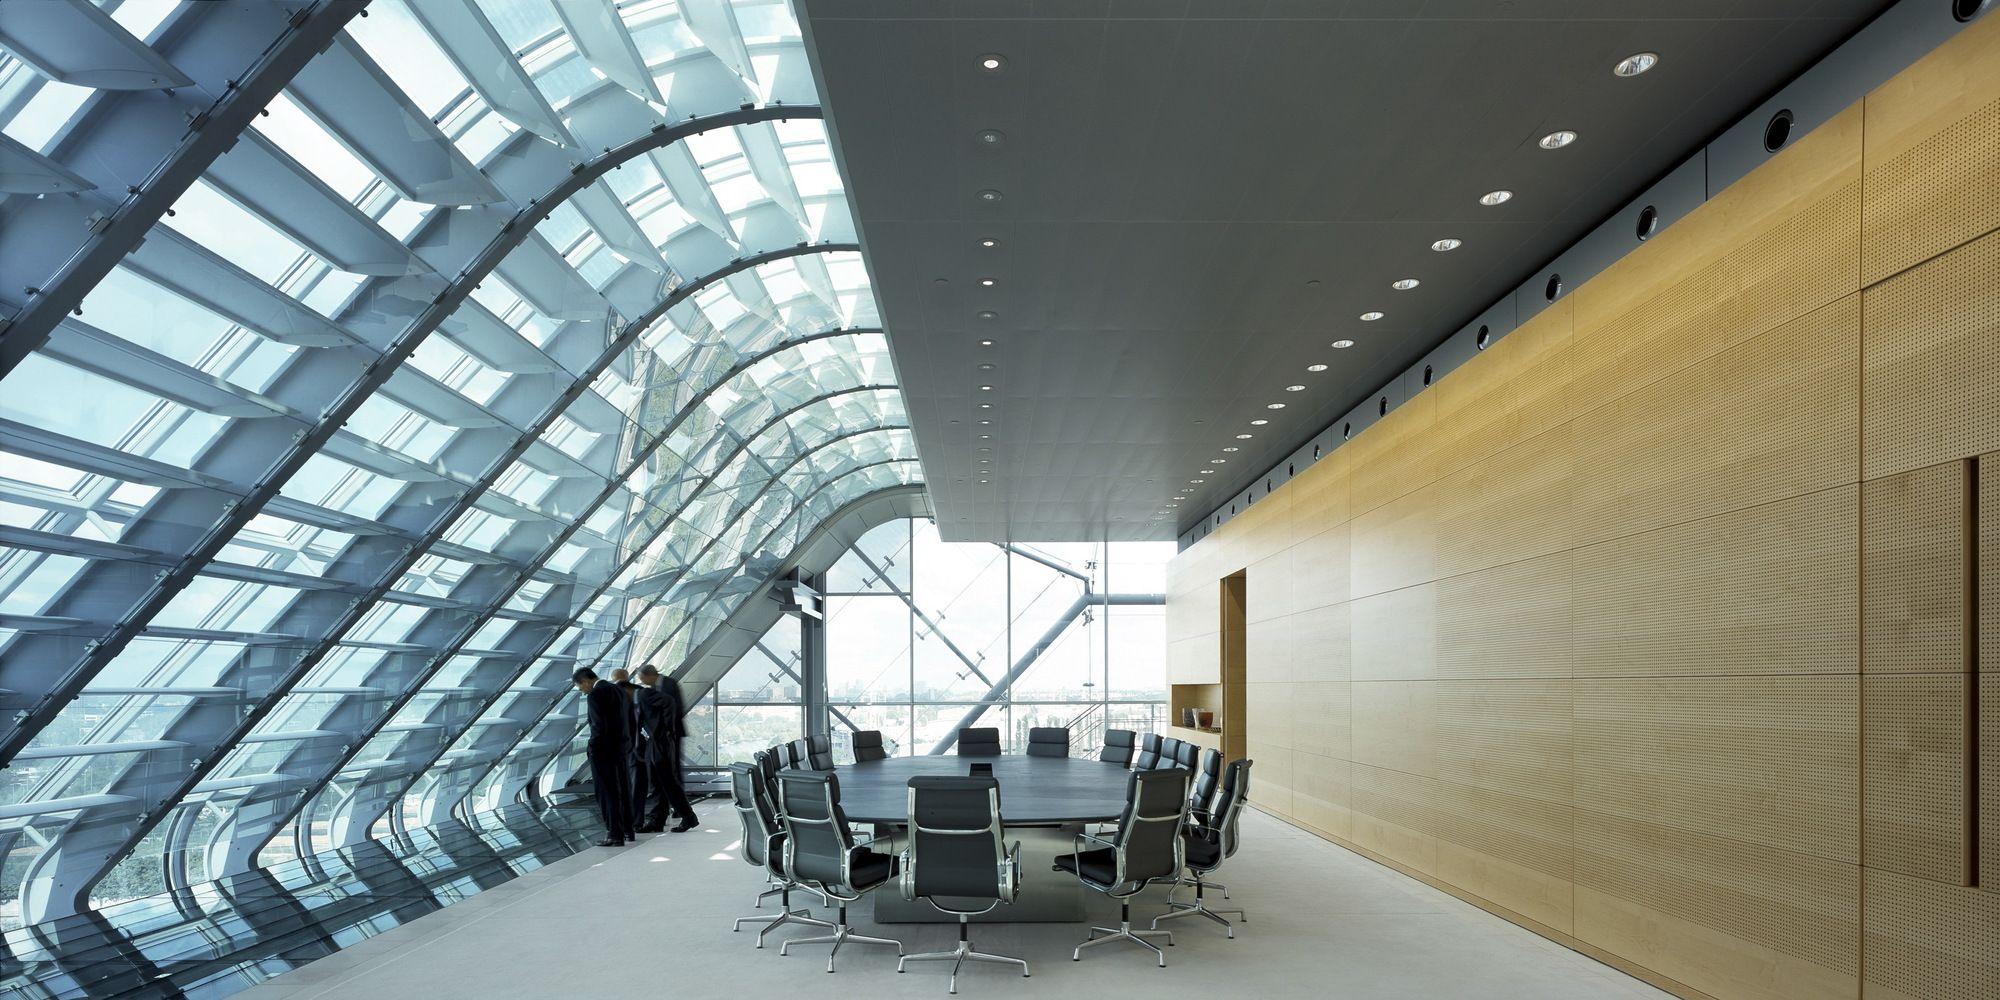 Sede principal de ING, Ámsterdam, Holanda - MVSA Architects